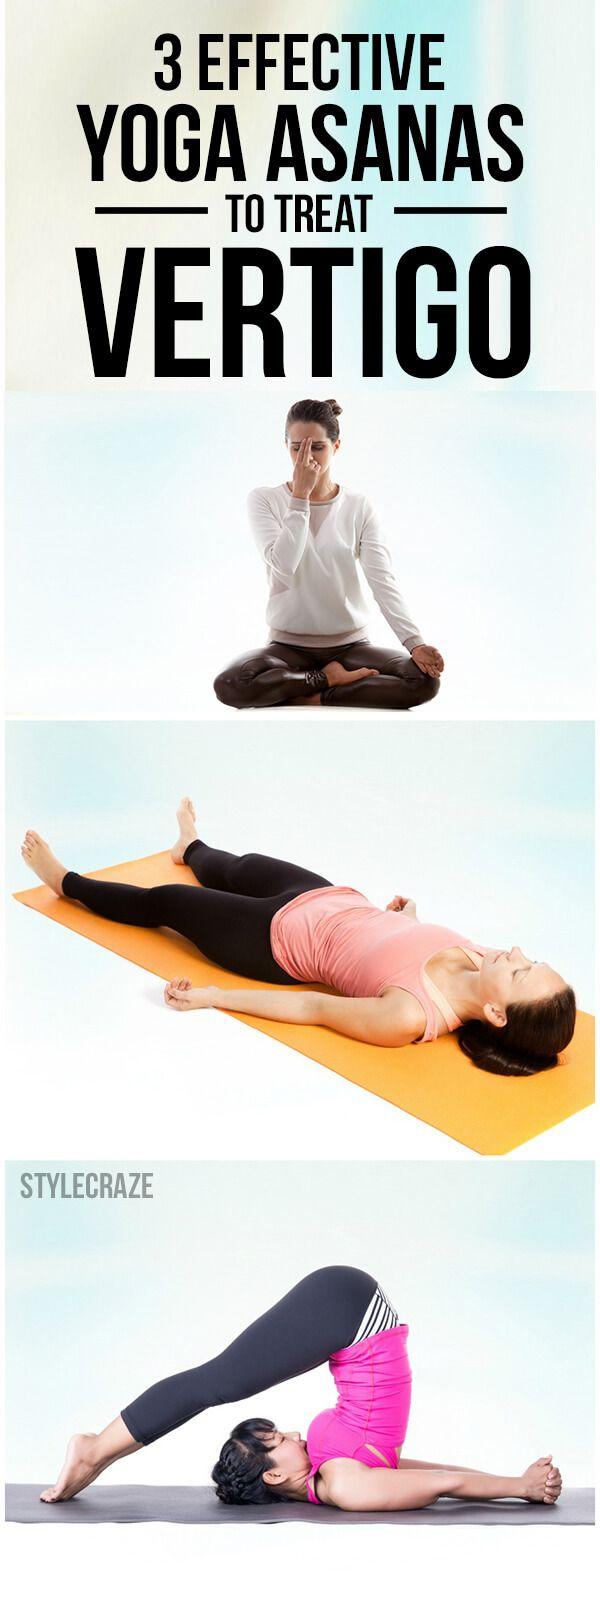 Did you know that performing certain yoga poses can help you overcome vertigo?